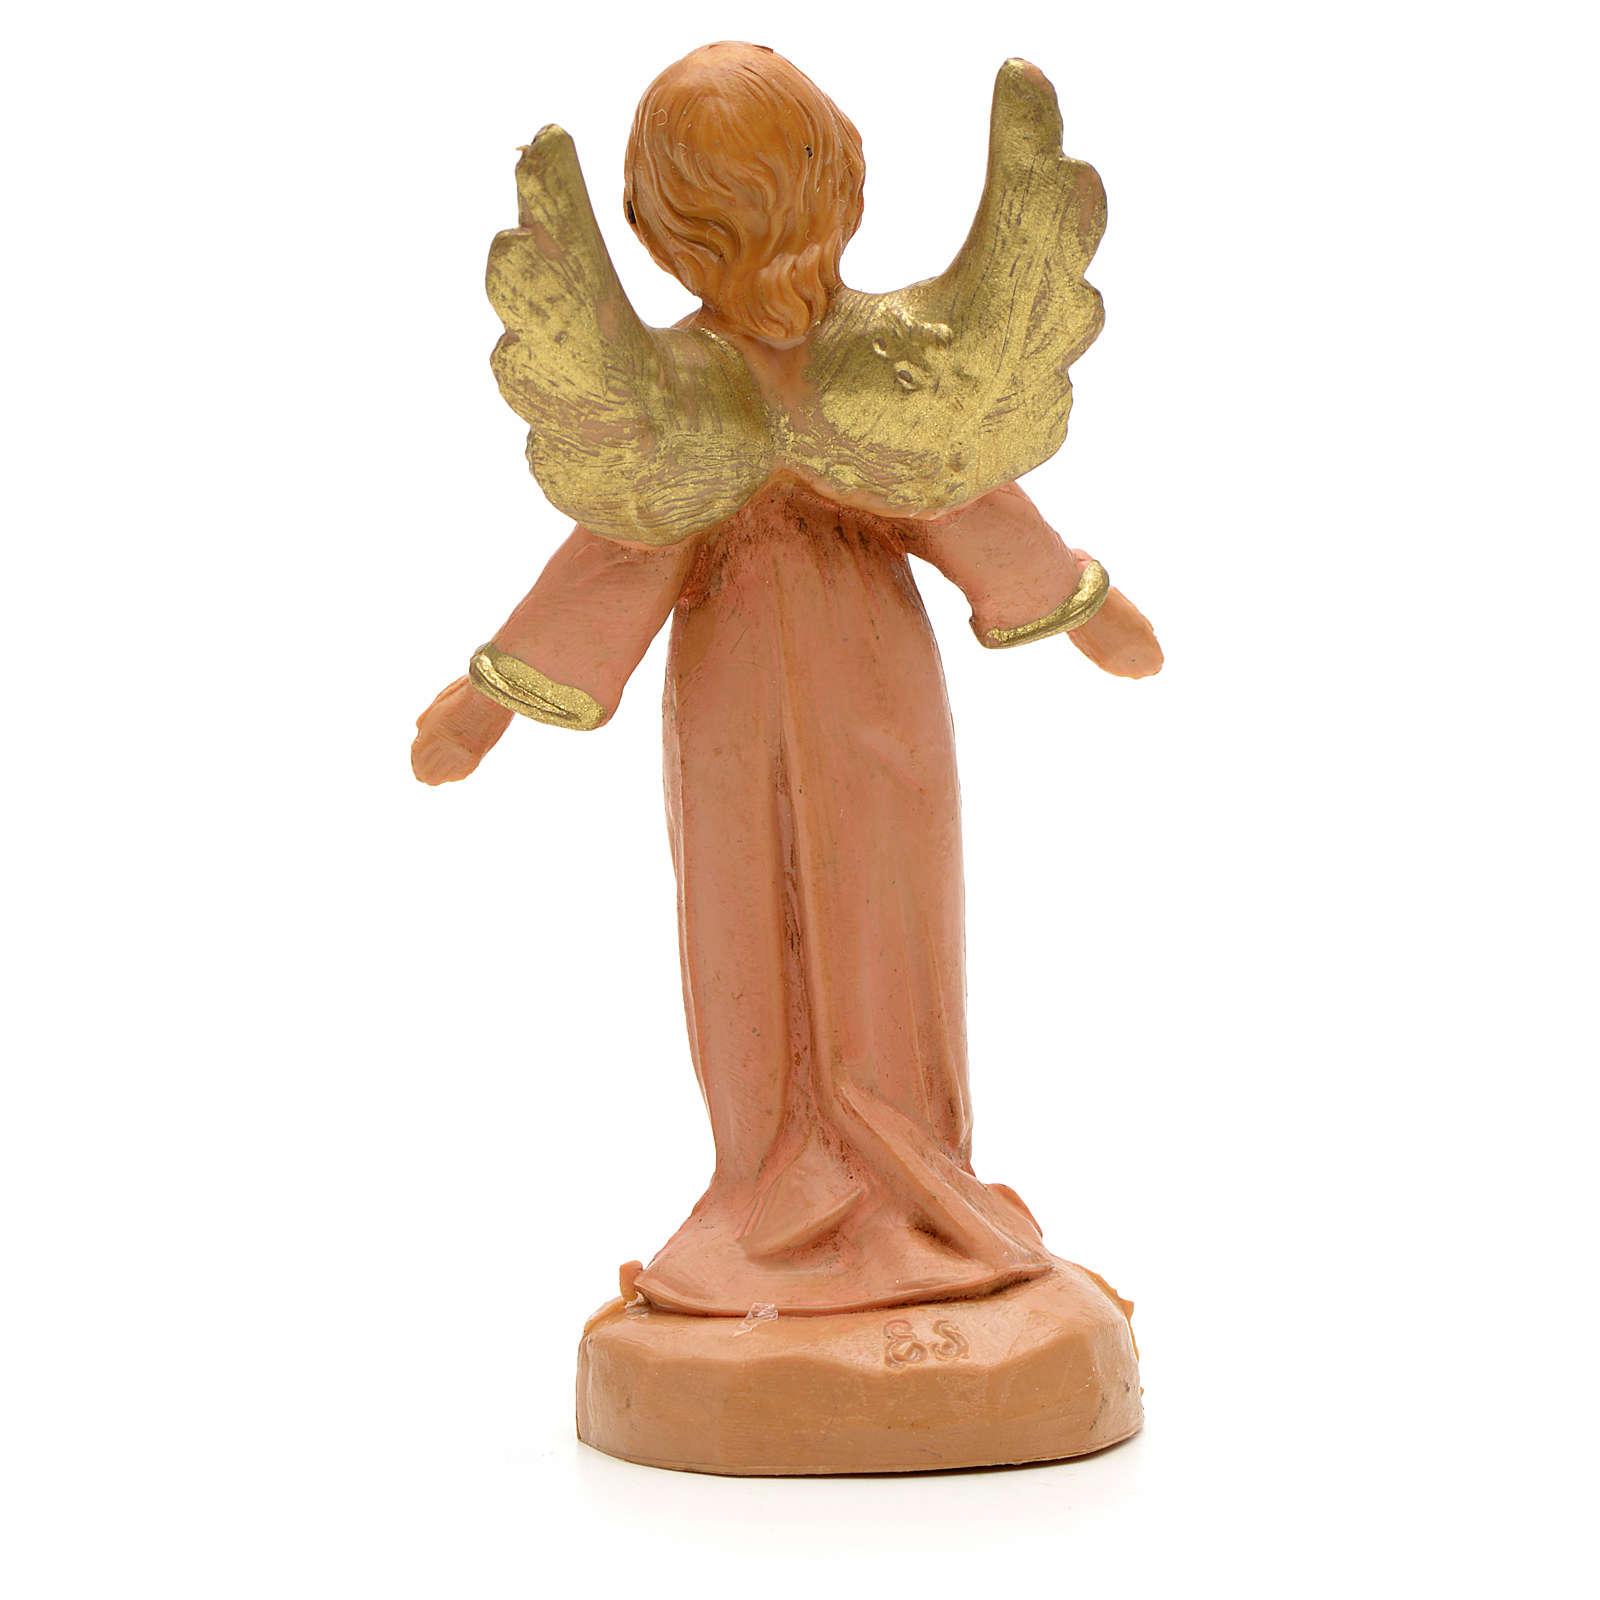 Stehende Engel 6,5cm, Fontanini 3